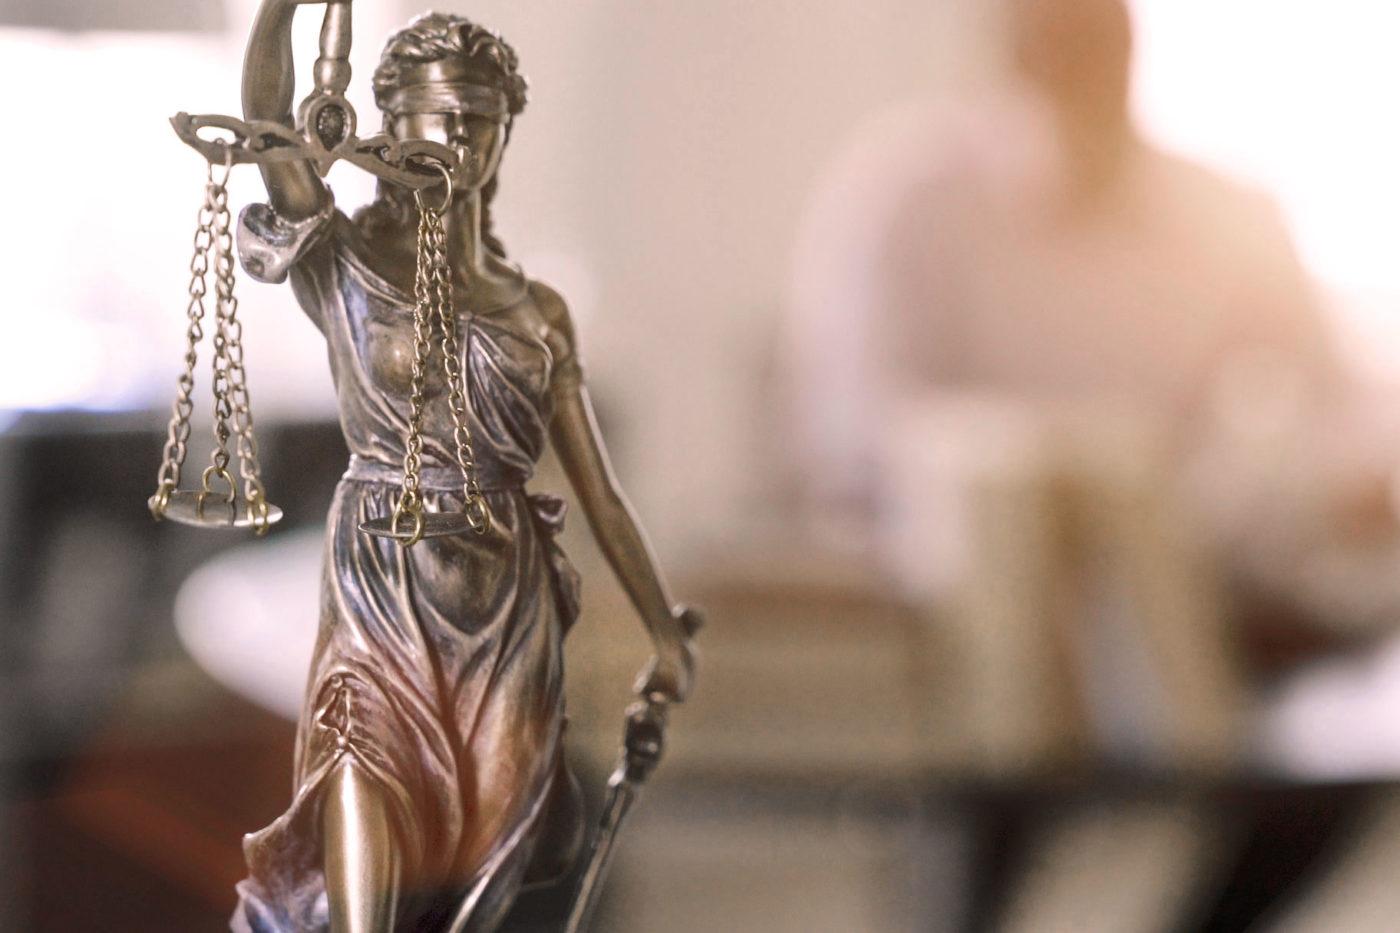 Gewerbe Rechtsanwalt Steuerbüro